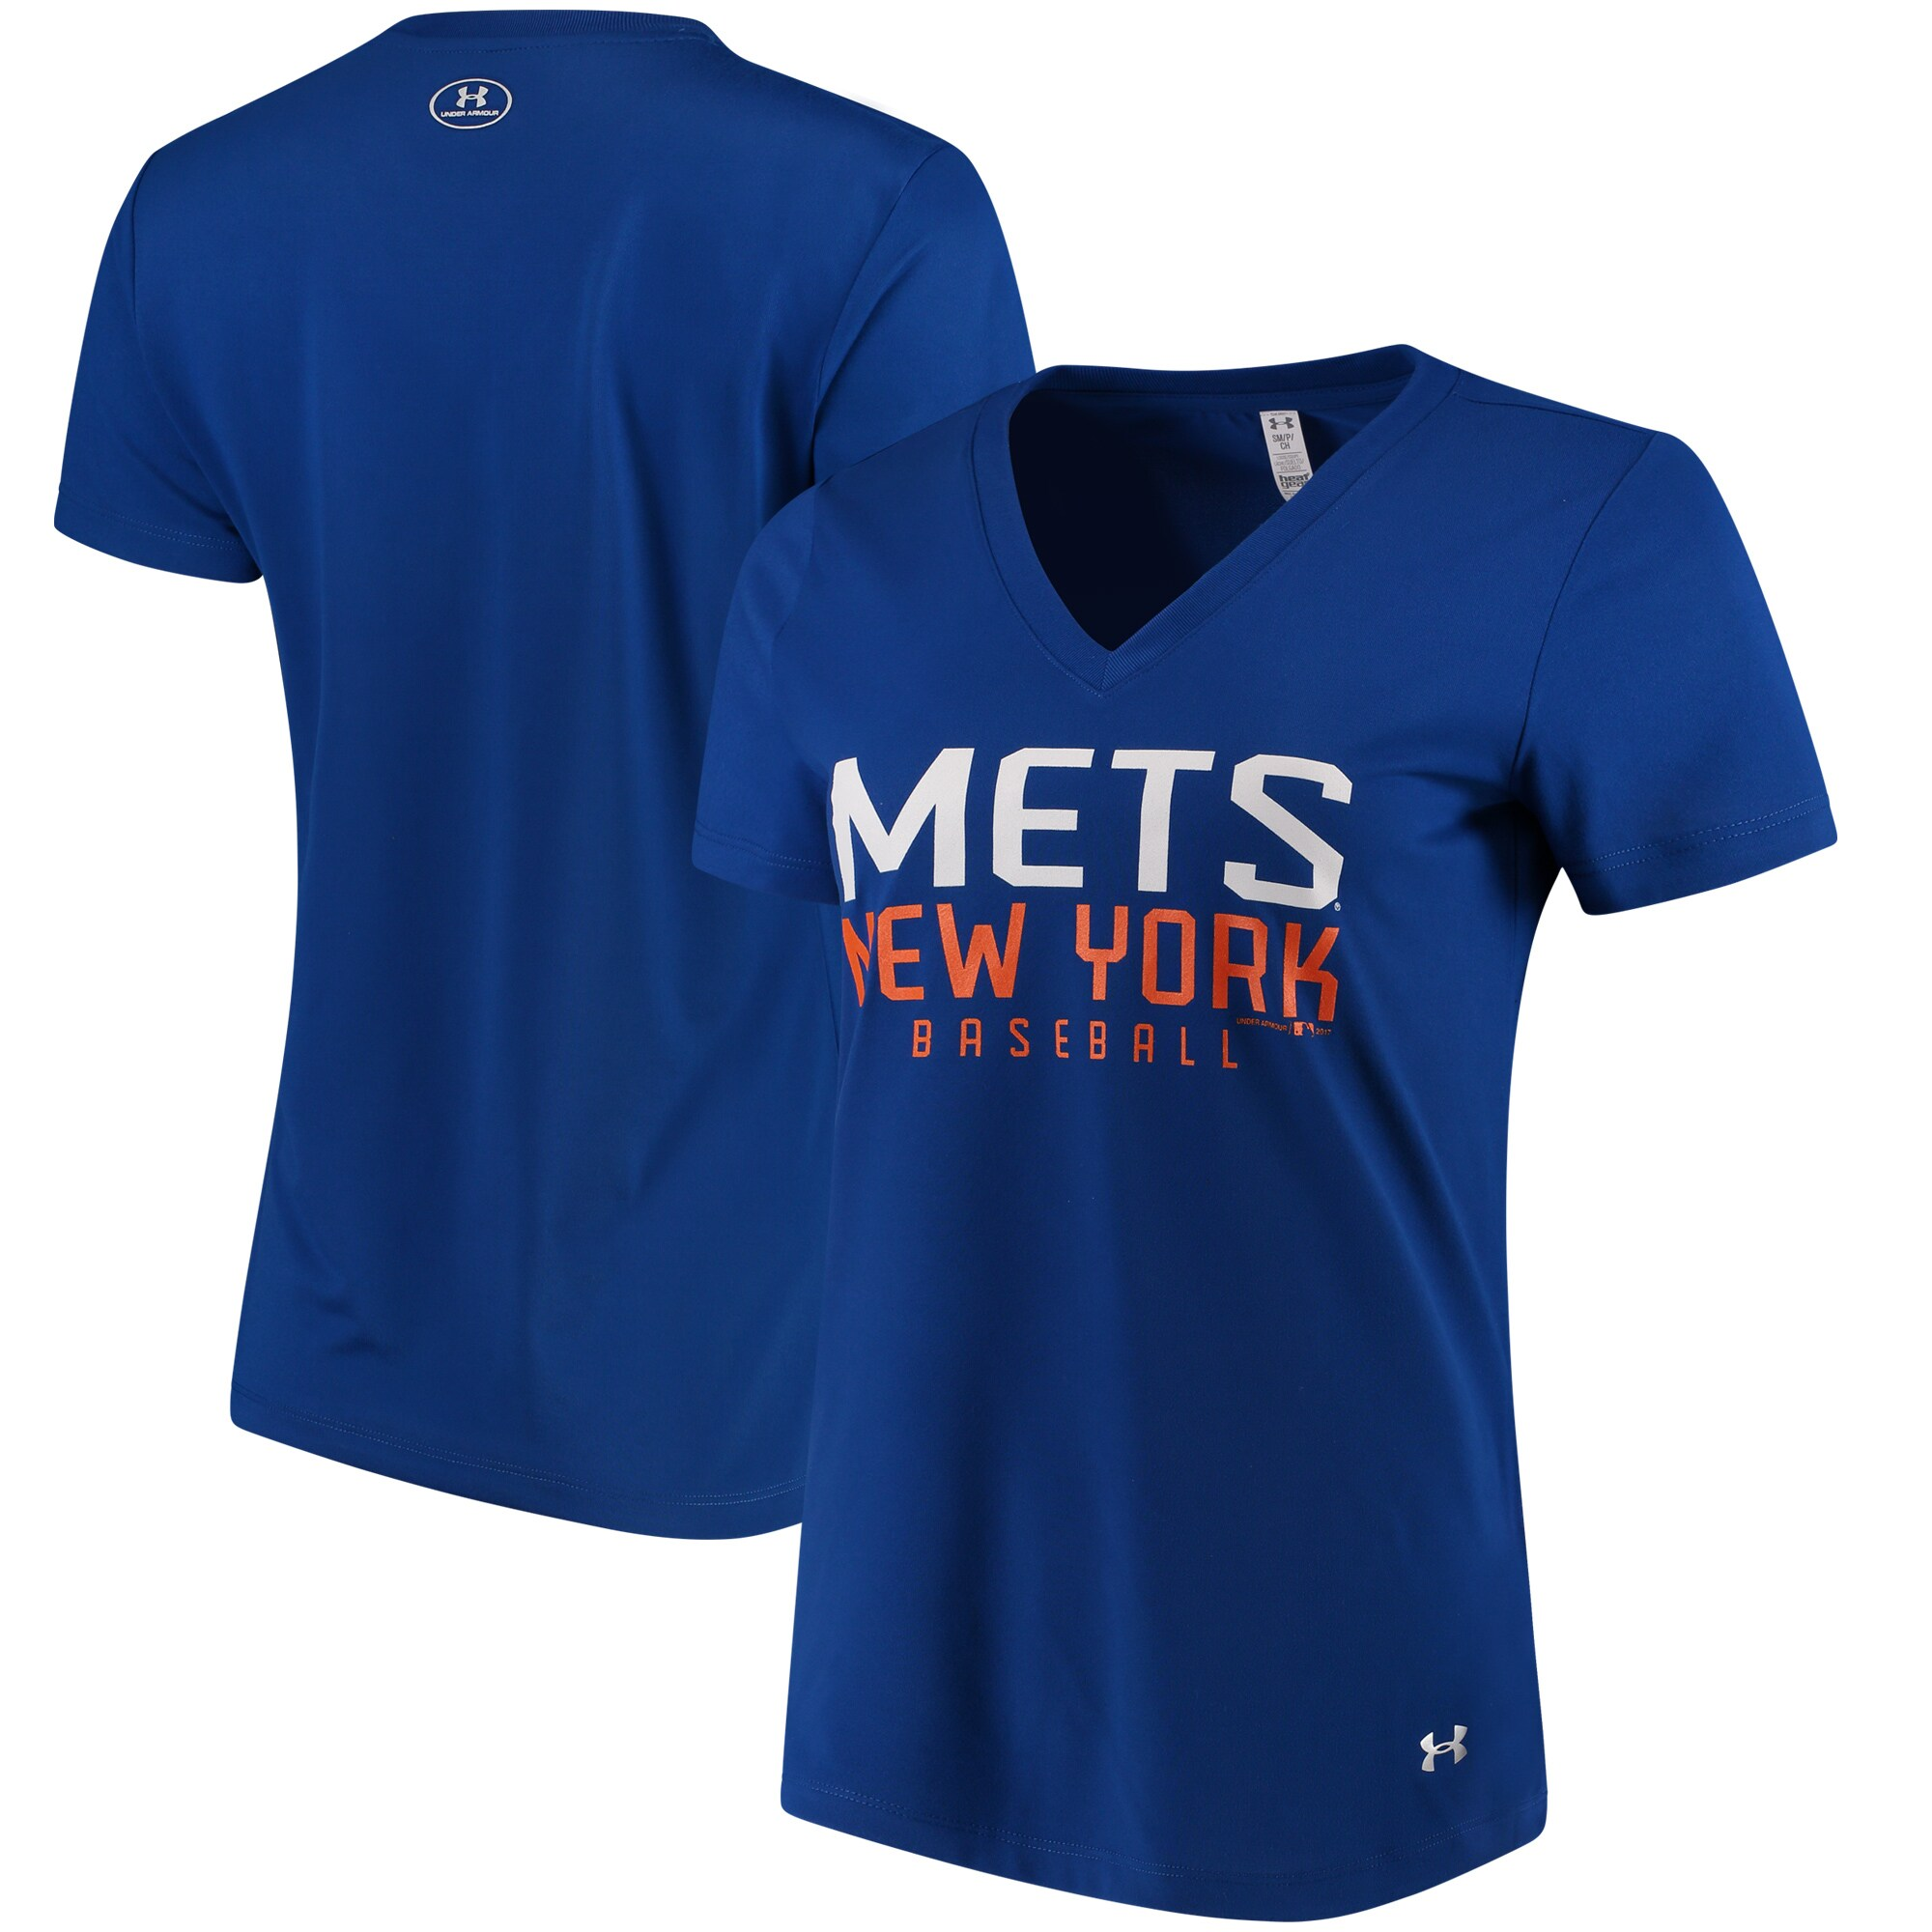 New York Mets Under Armour Women's Tech Performance V-Neck T-Shirt - Royal